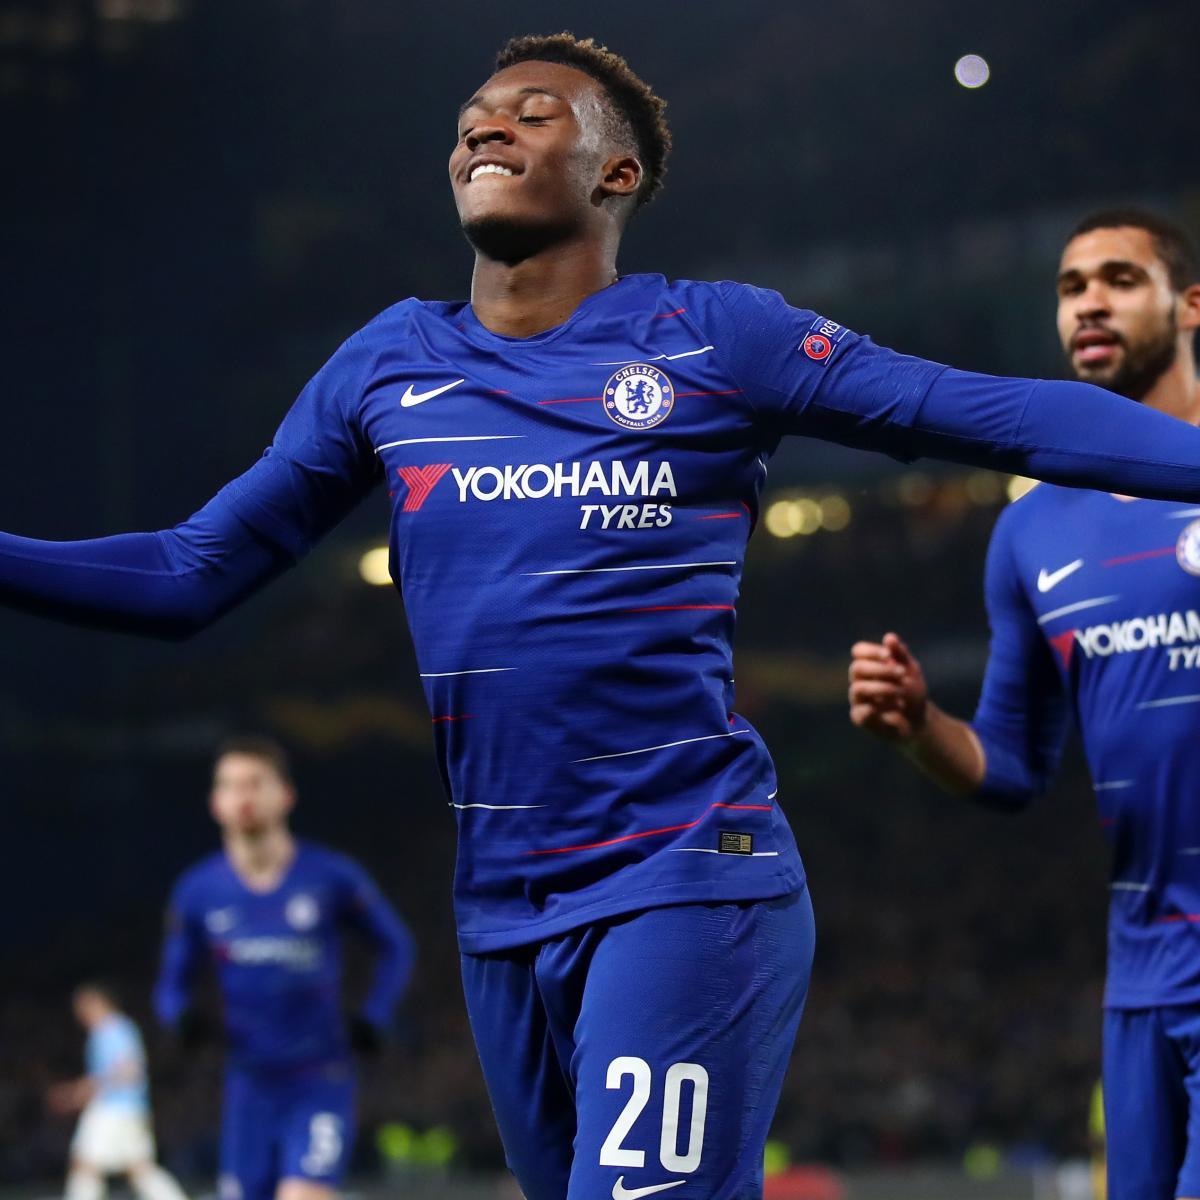 Champions League 2019 Round Of 16 Leg 2 Live Stream Tv: Chelsea Vs. Dynamo Kiev: Odds, Preview, Live Stream, TV